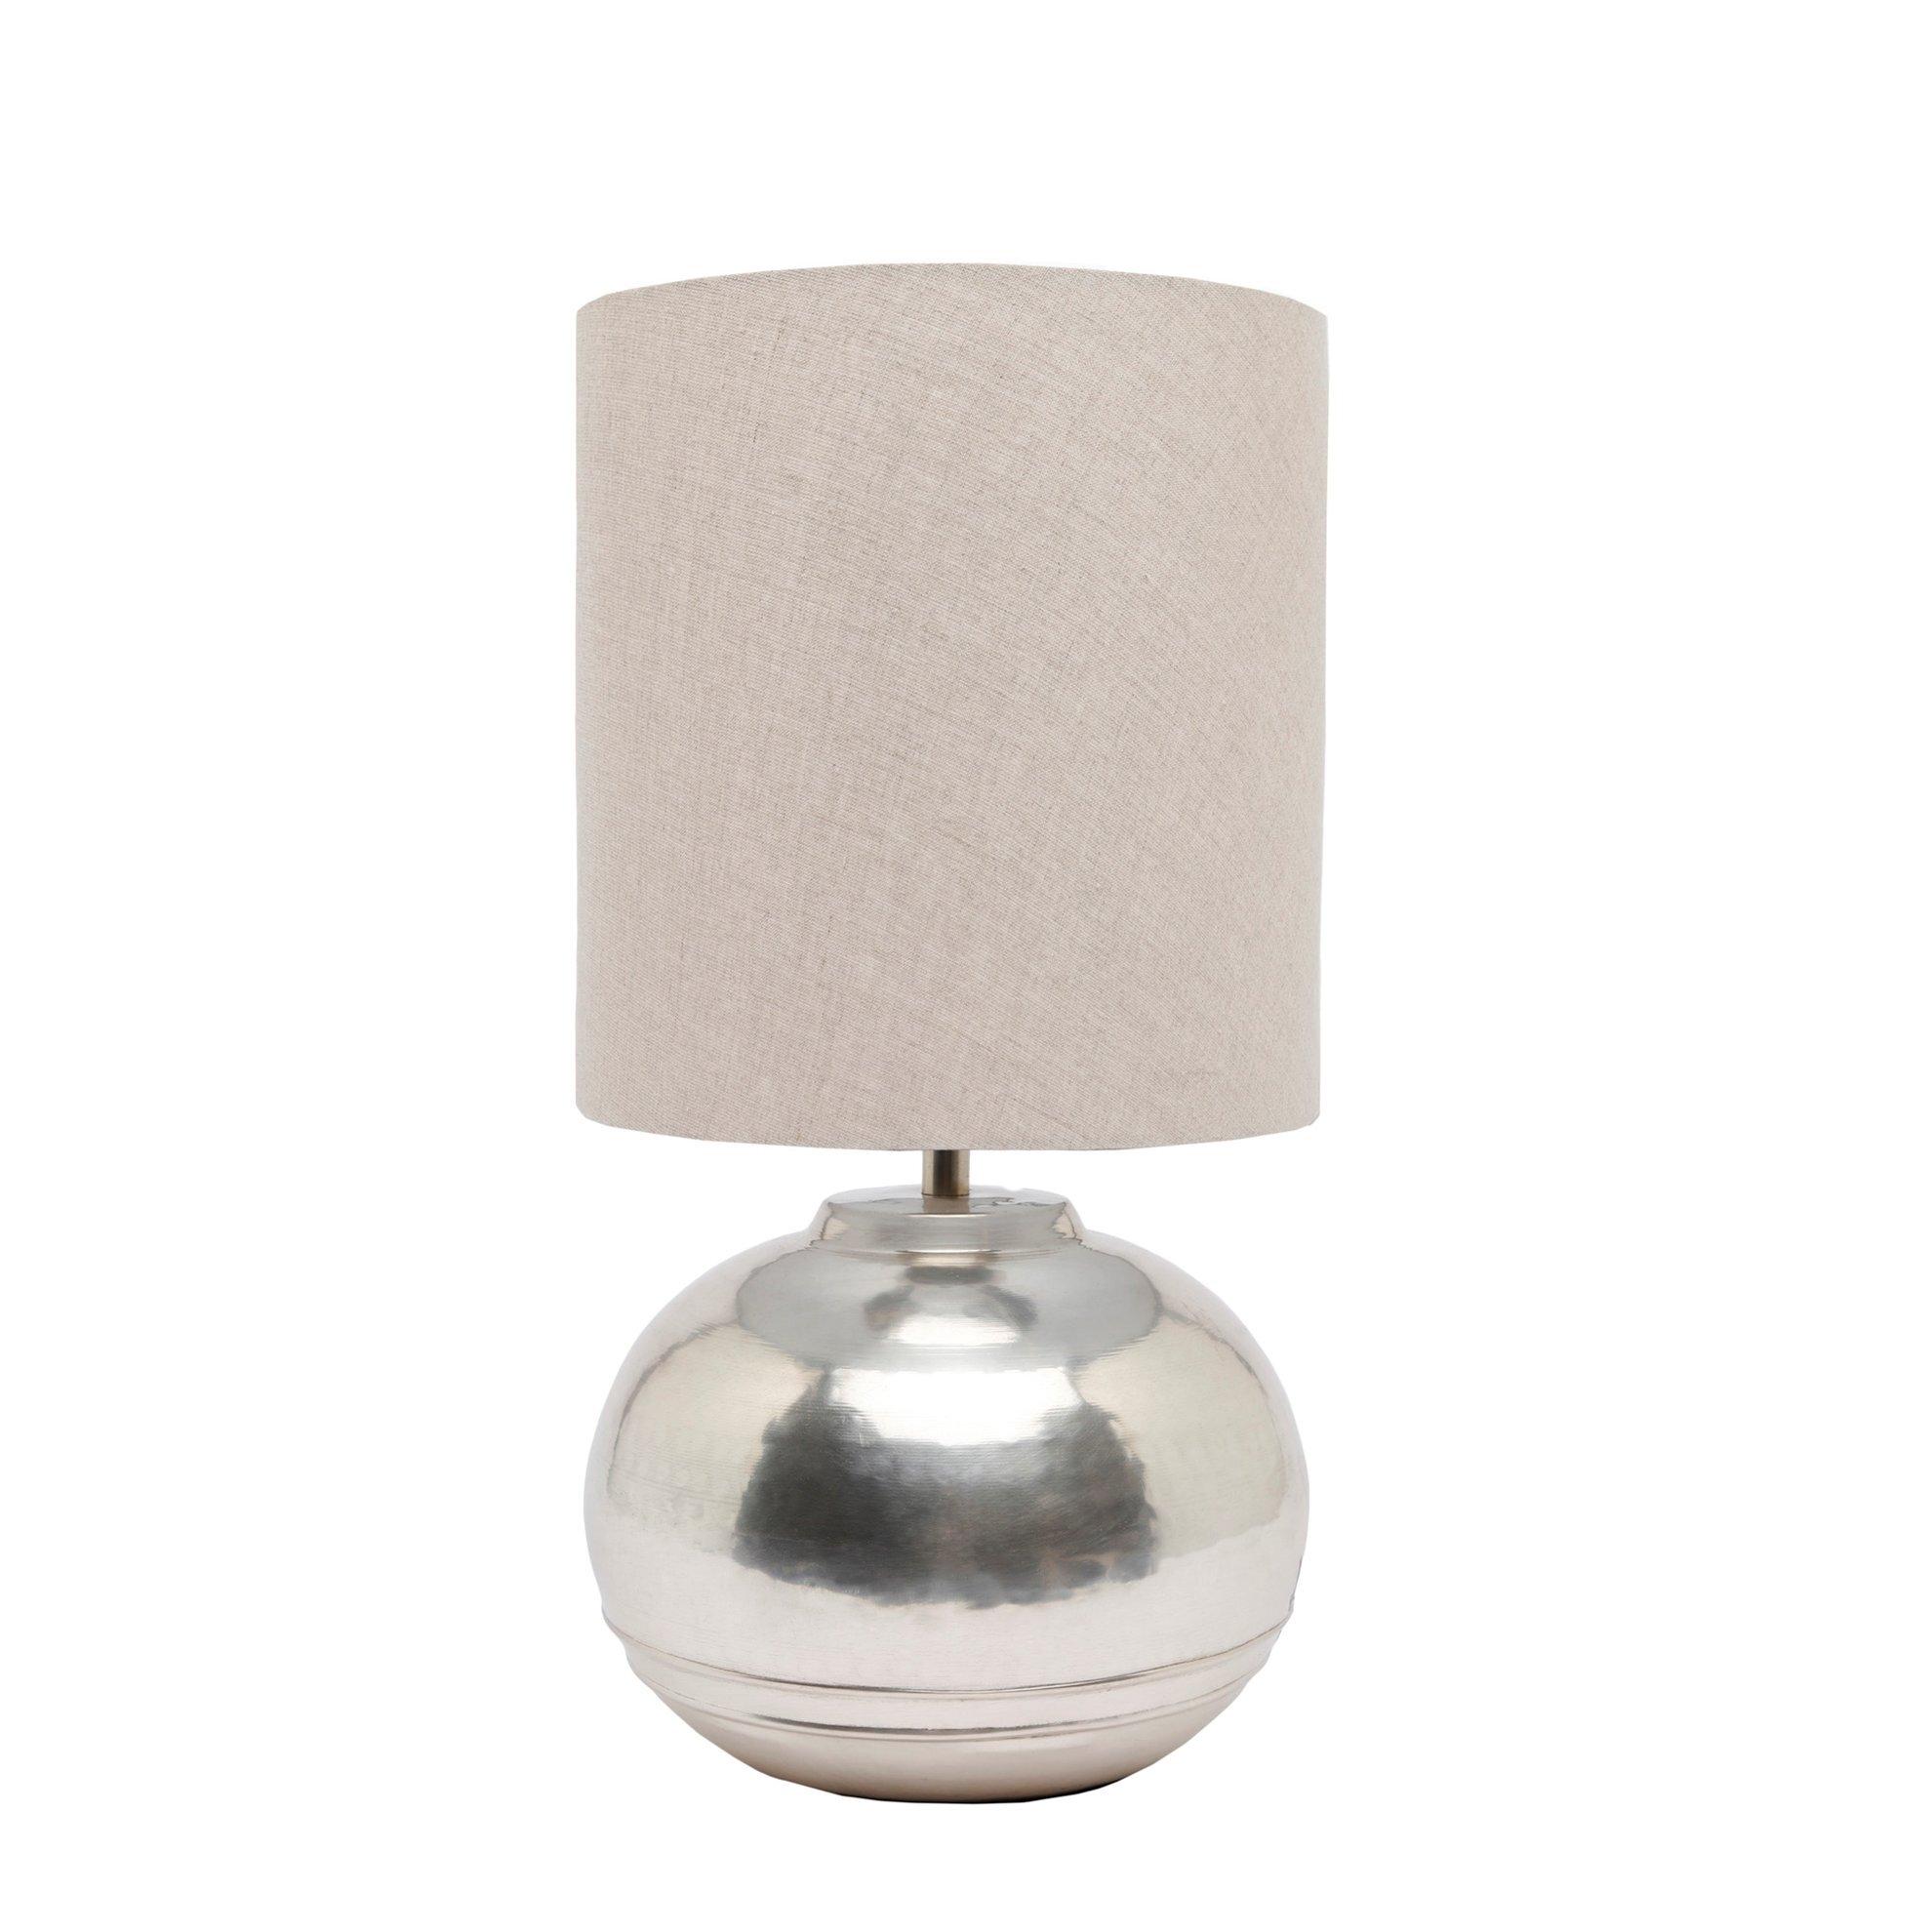 resm Gümüş Kaplama Pirinç Abajur ( 25 X 49 Cm )